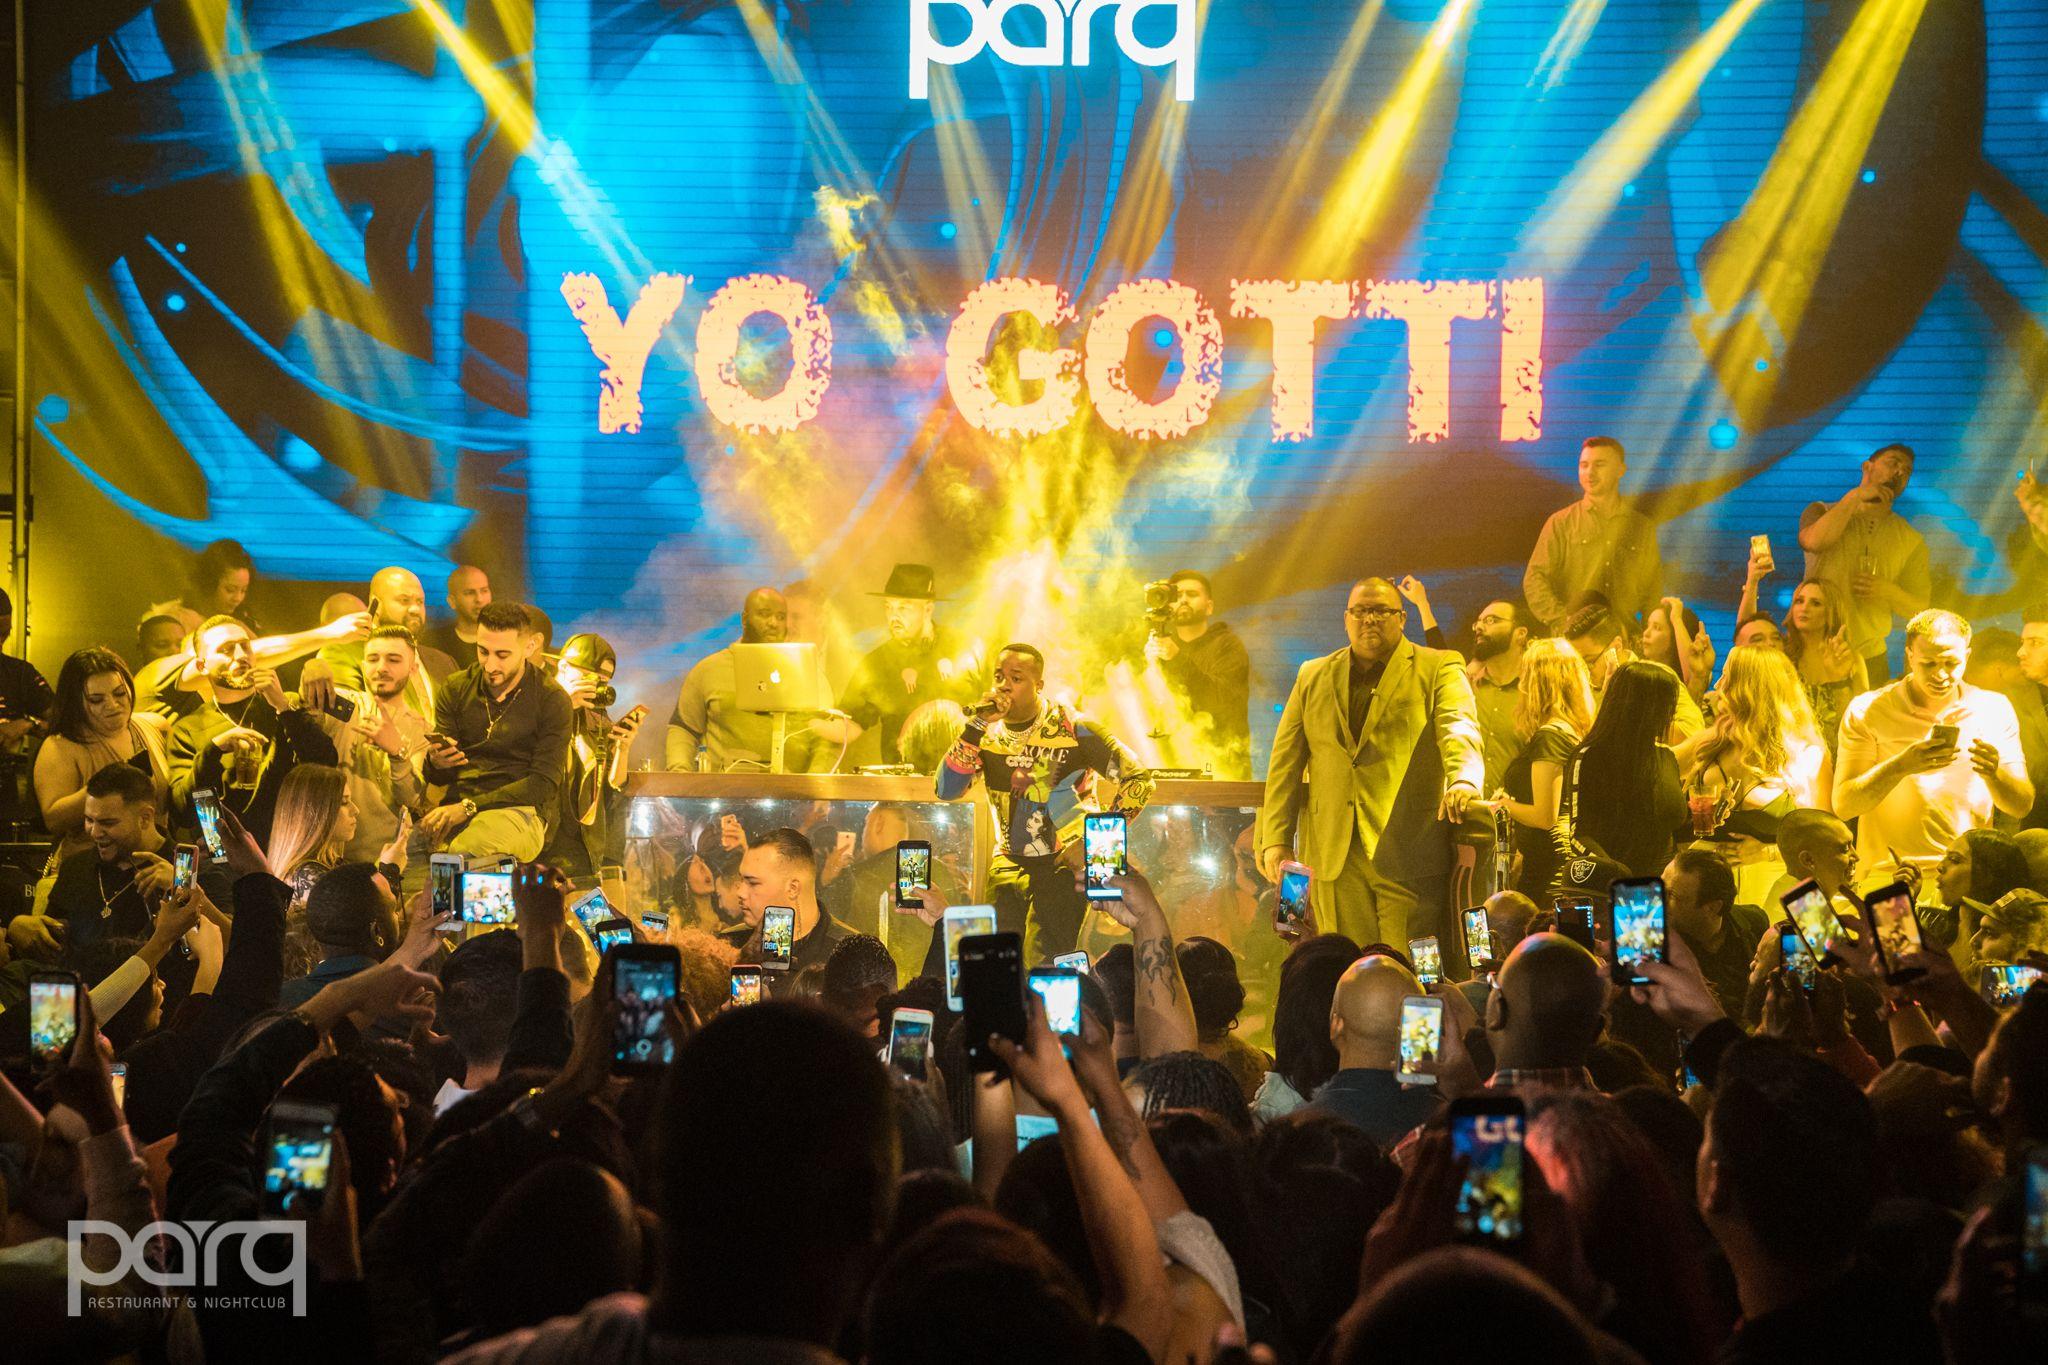 03.02.18 Parq - Yo Gotti-42.jpg